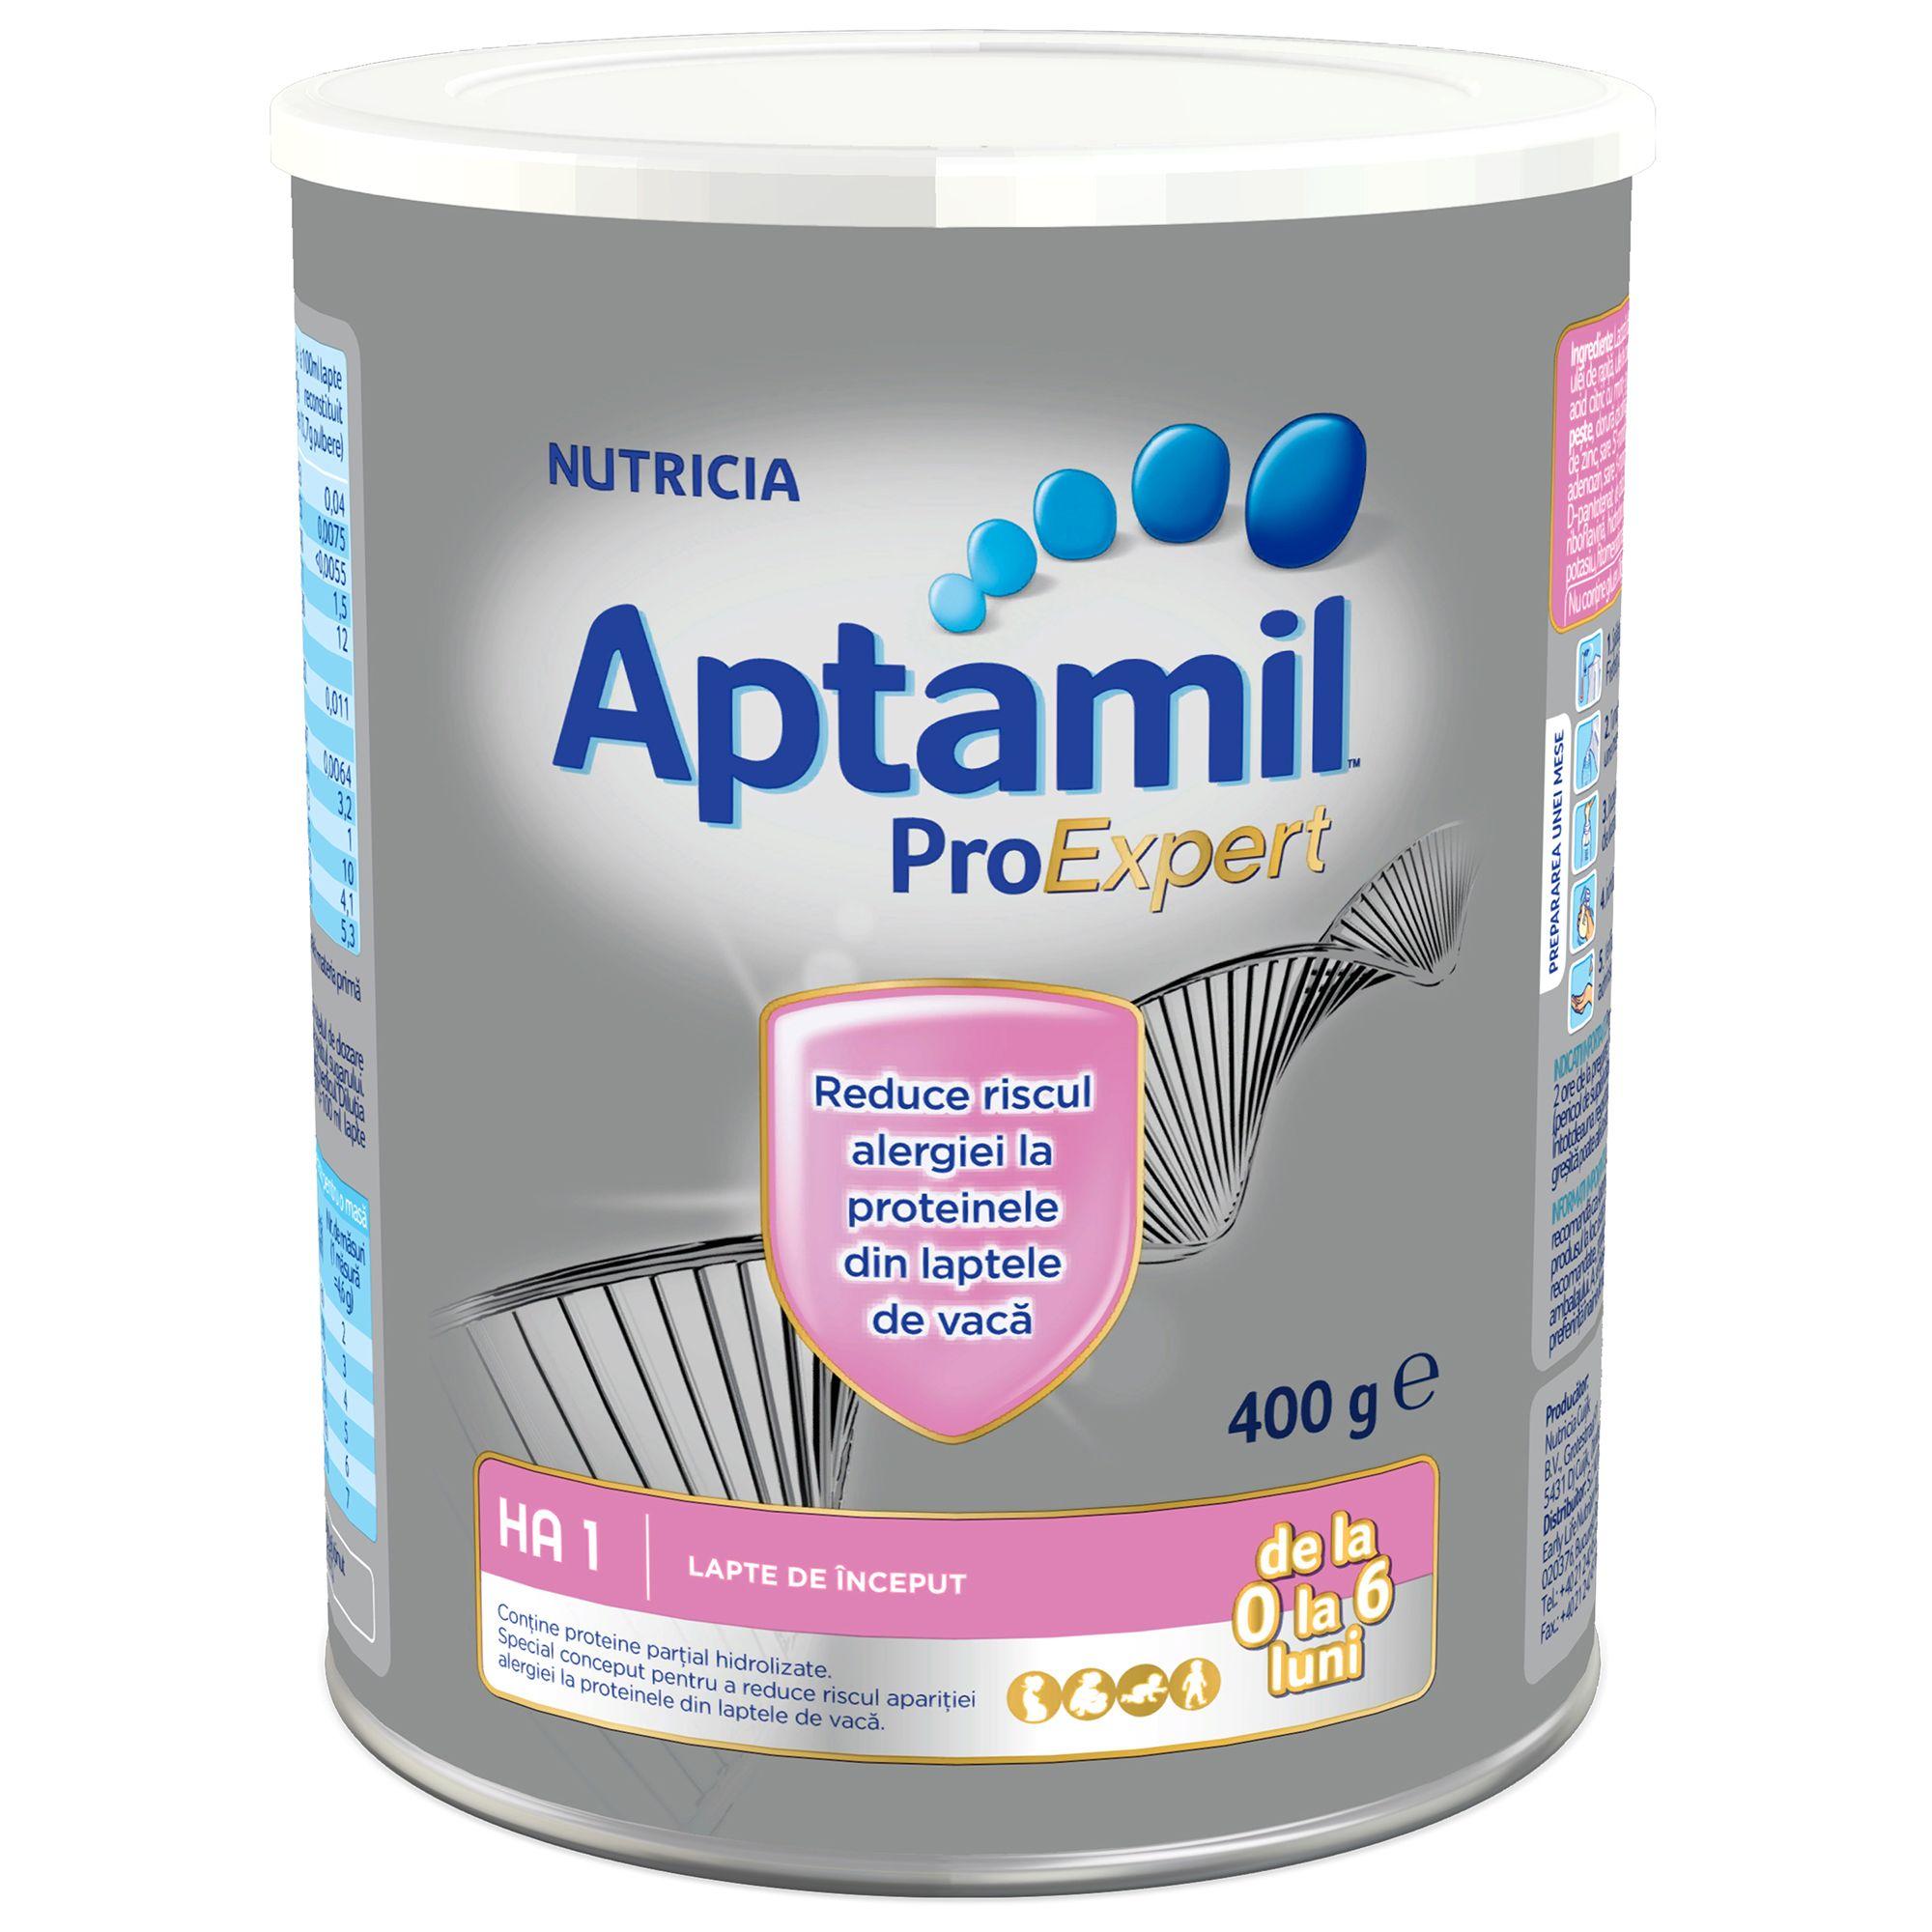 Lapte praf hipoalergenic Nutricia, Aptamil HA1, 400G, 0-6 luni